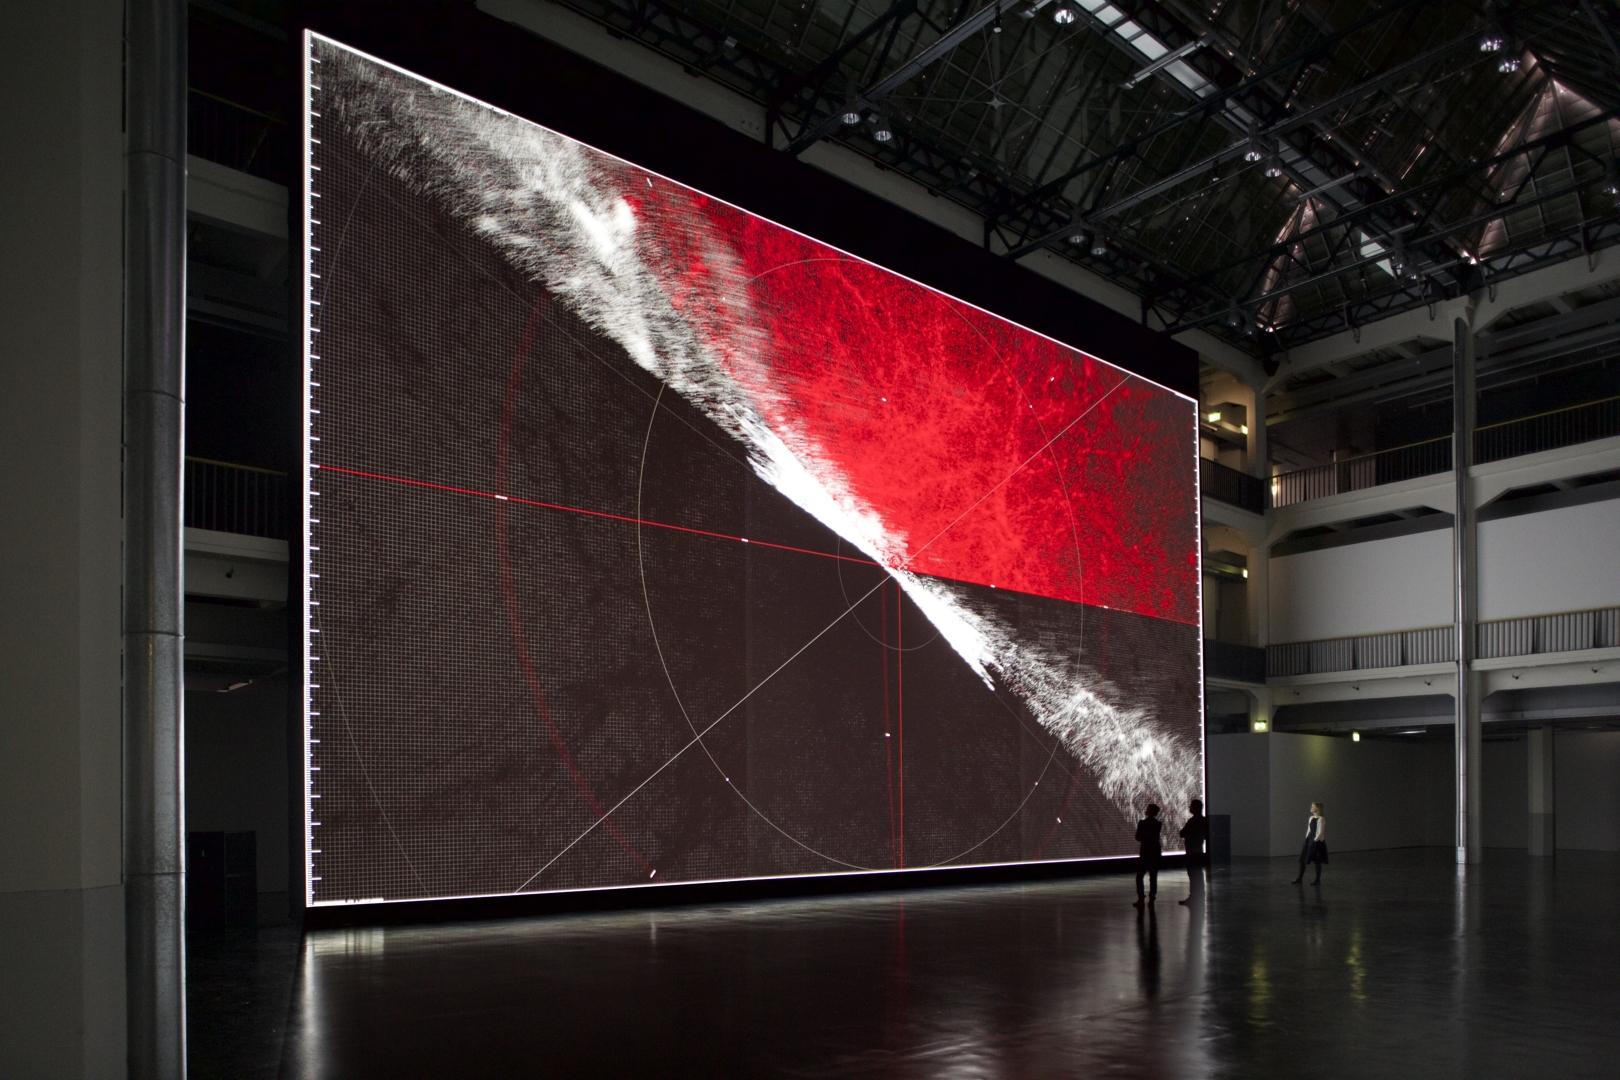 Ryoji Ikeda, the planck universe [macro], 2015 Image Martin Wagenhan Courtesy of ZKM  Karlsruhe  image